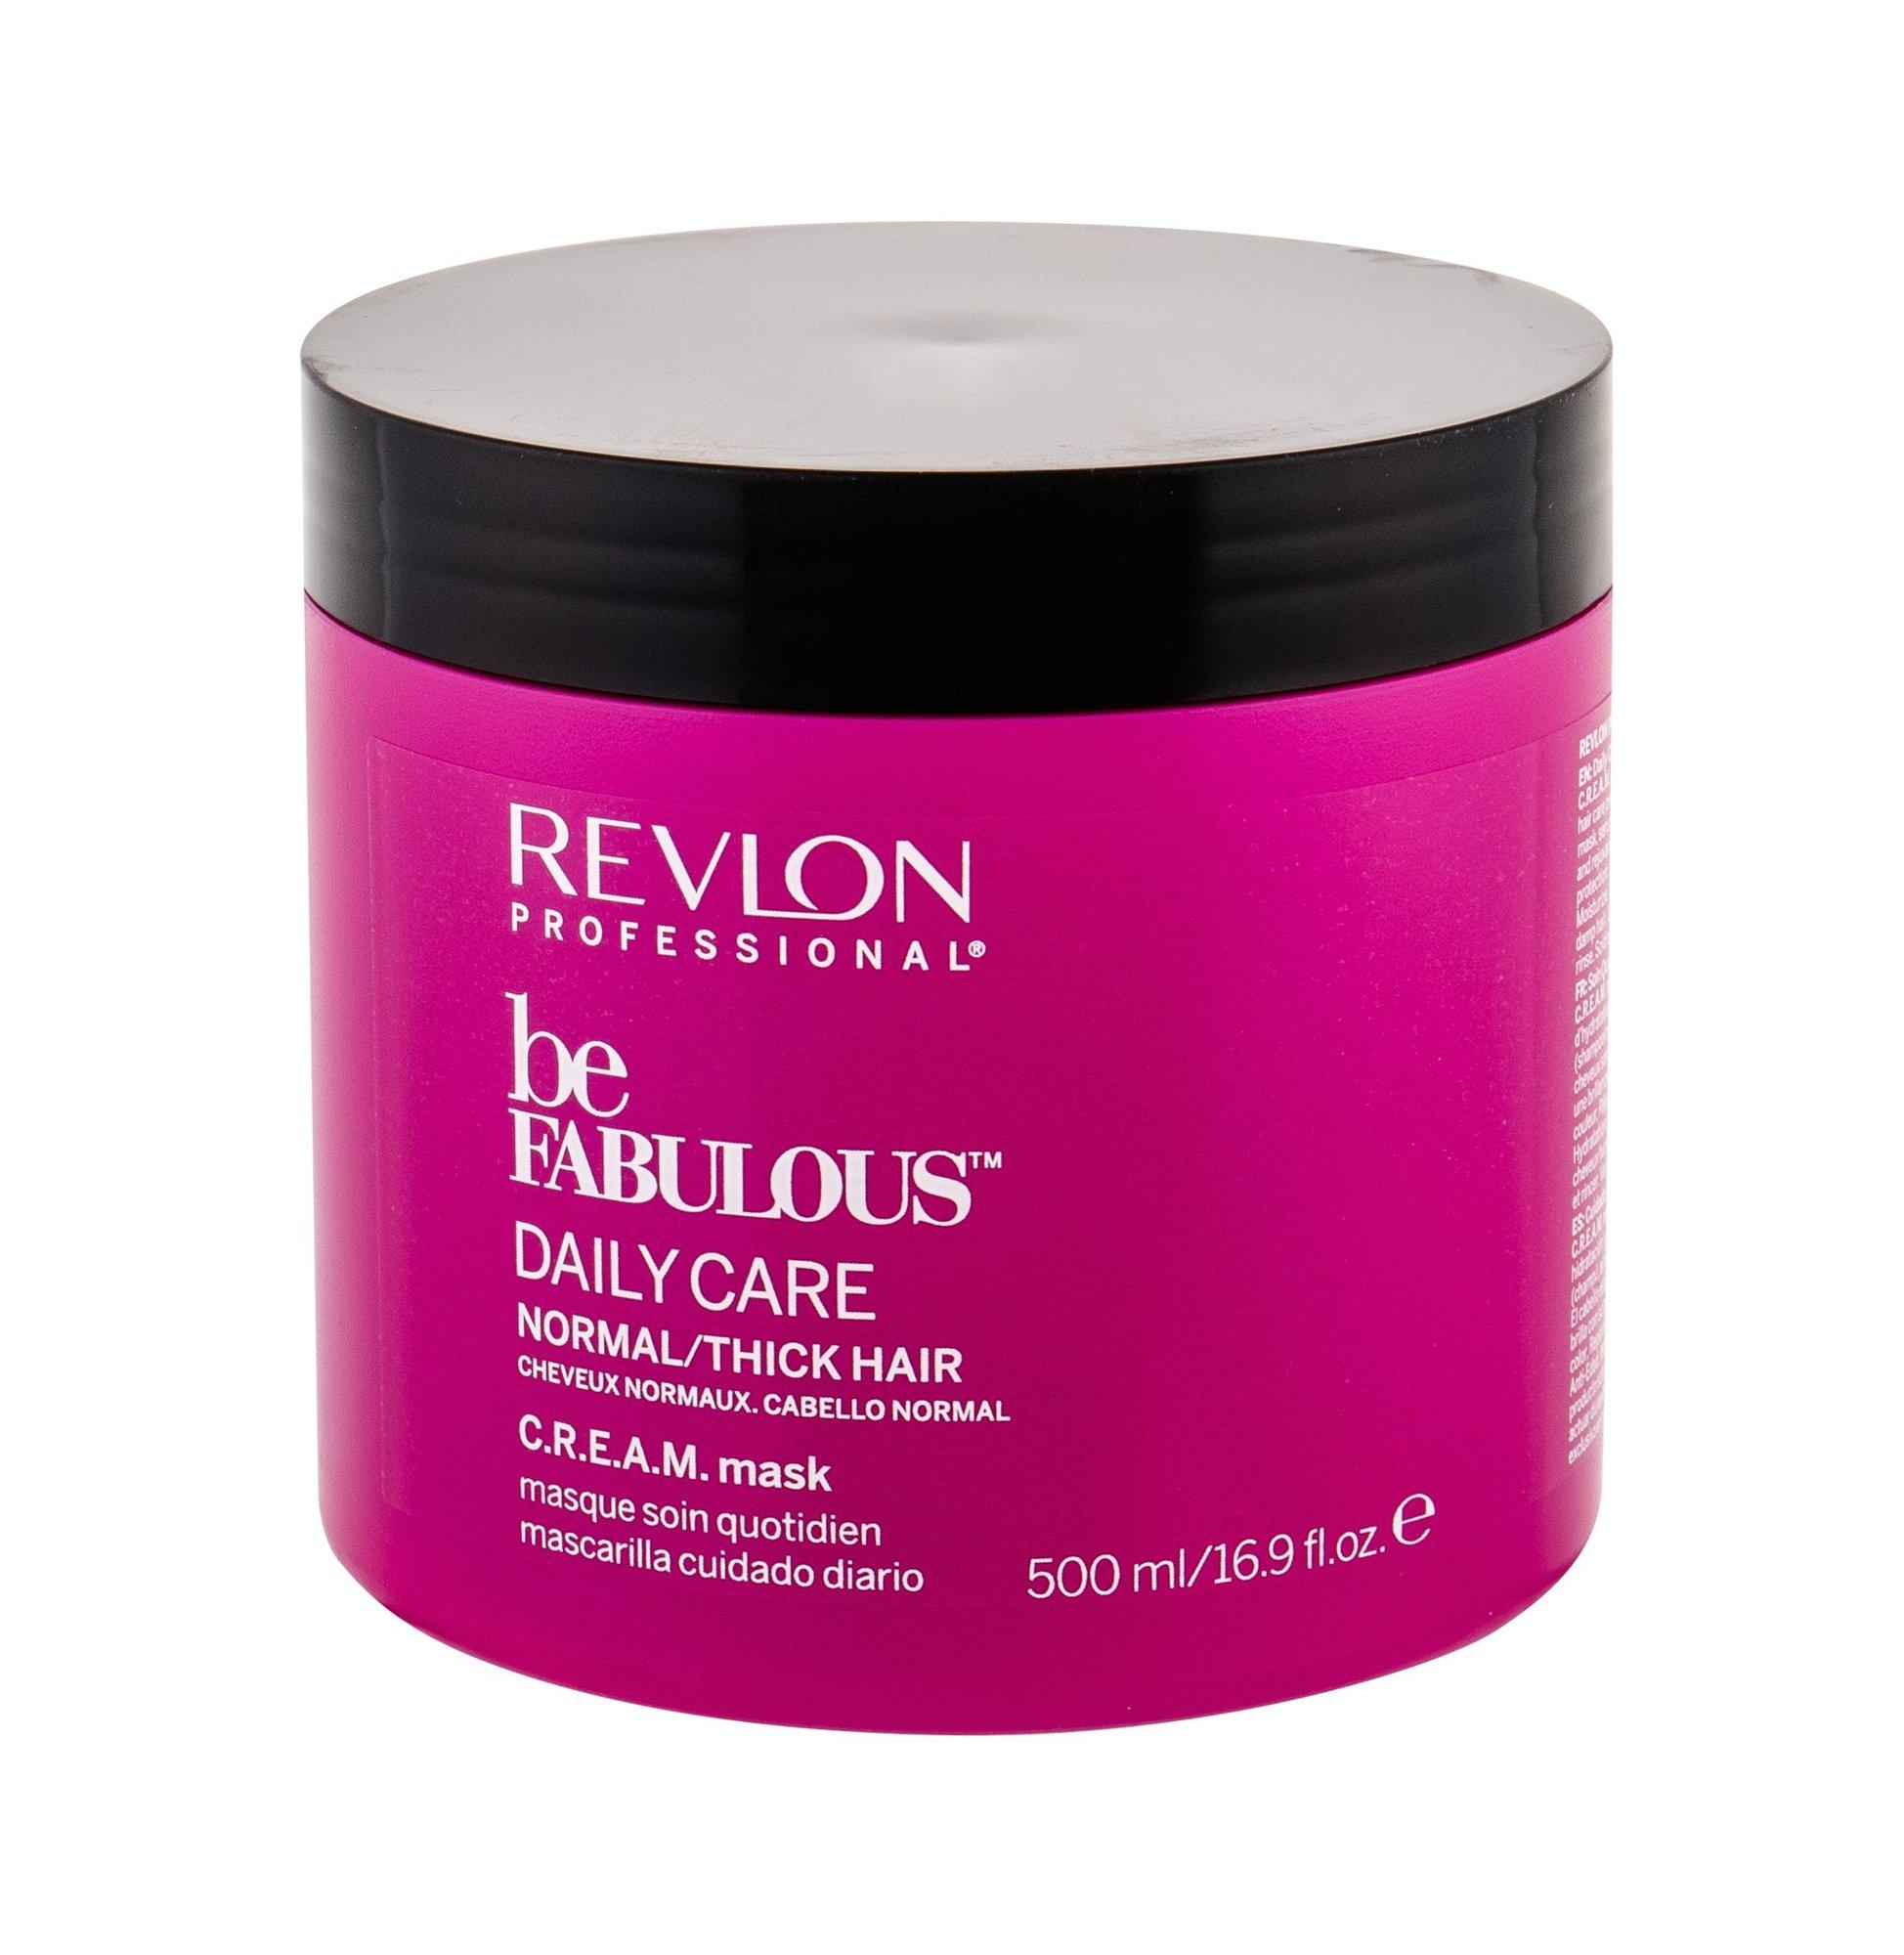 Revlon Professional Be Fabulous Hair Mask 500ml